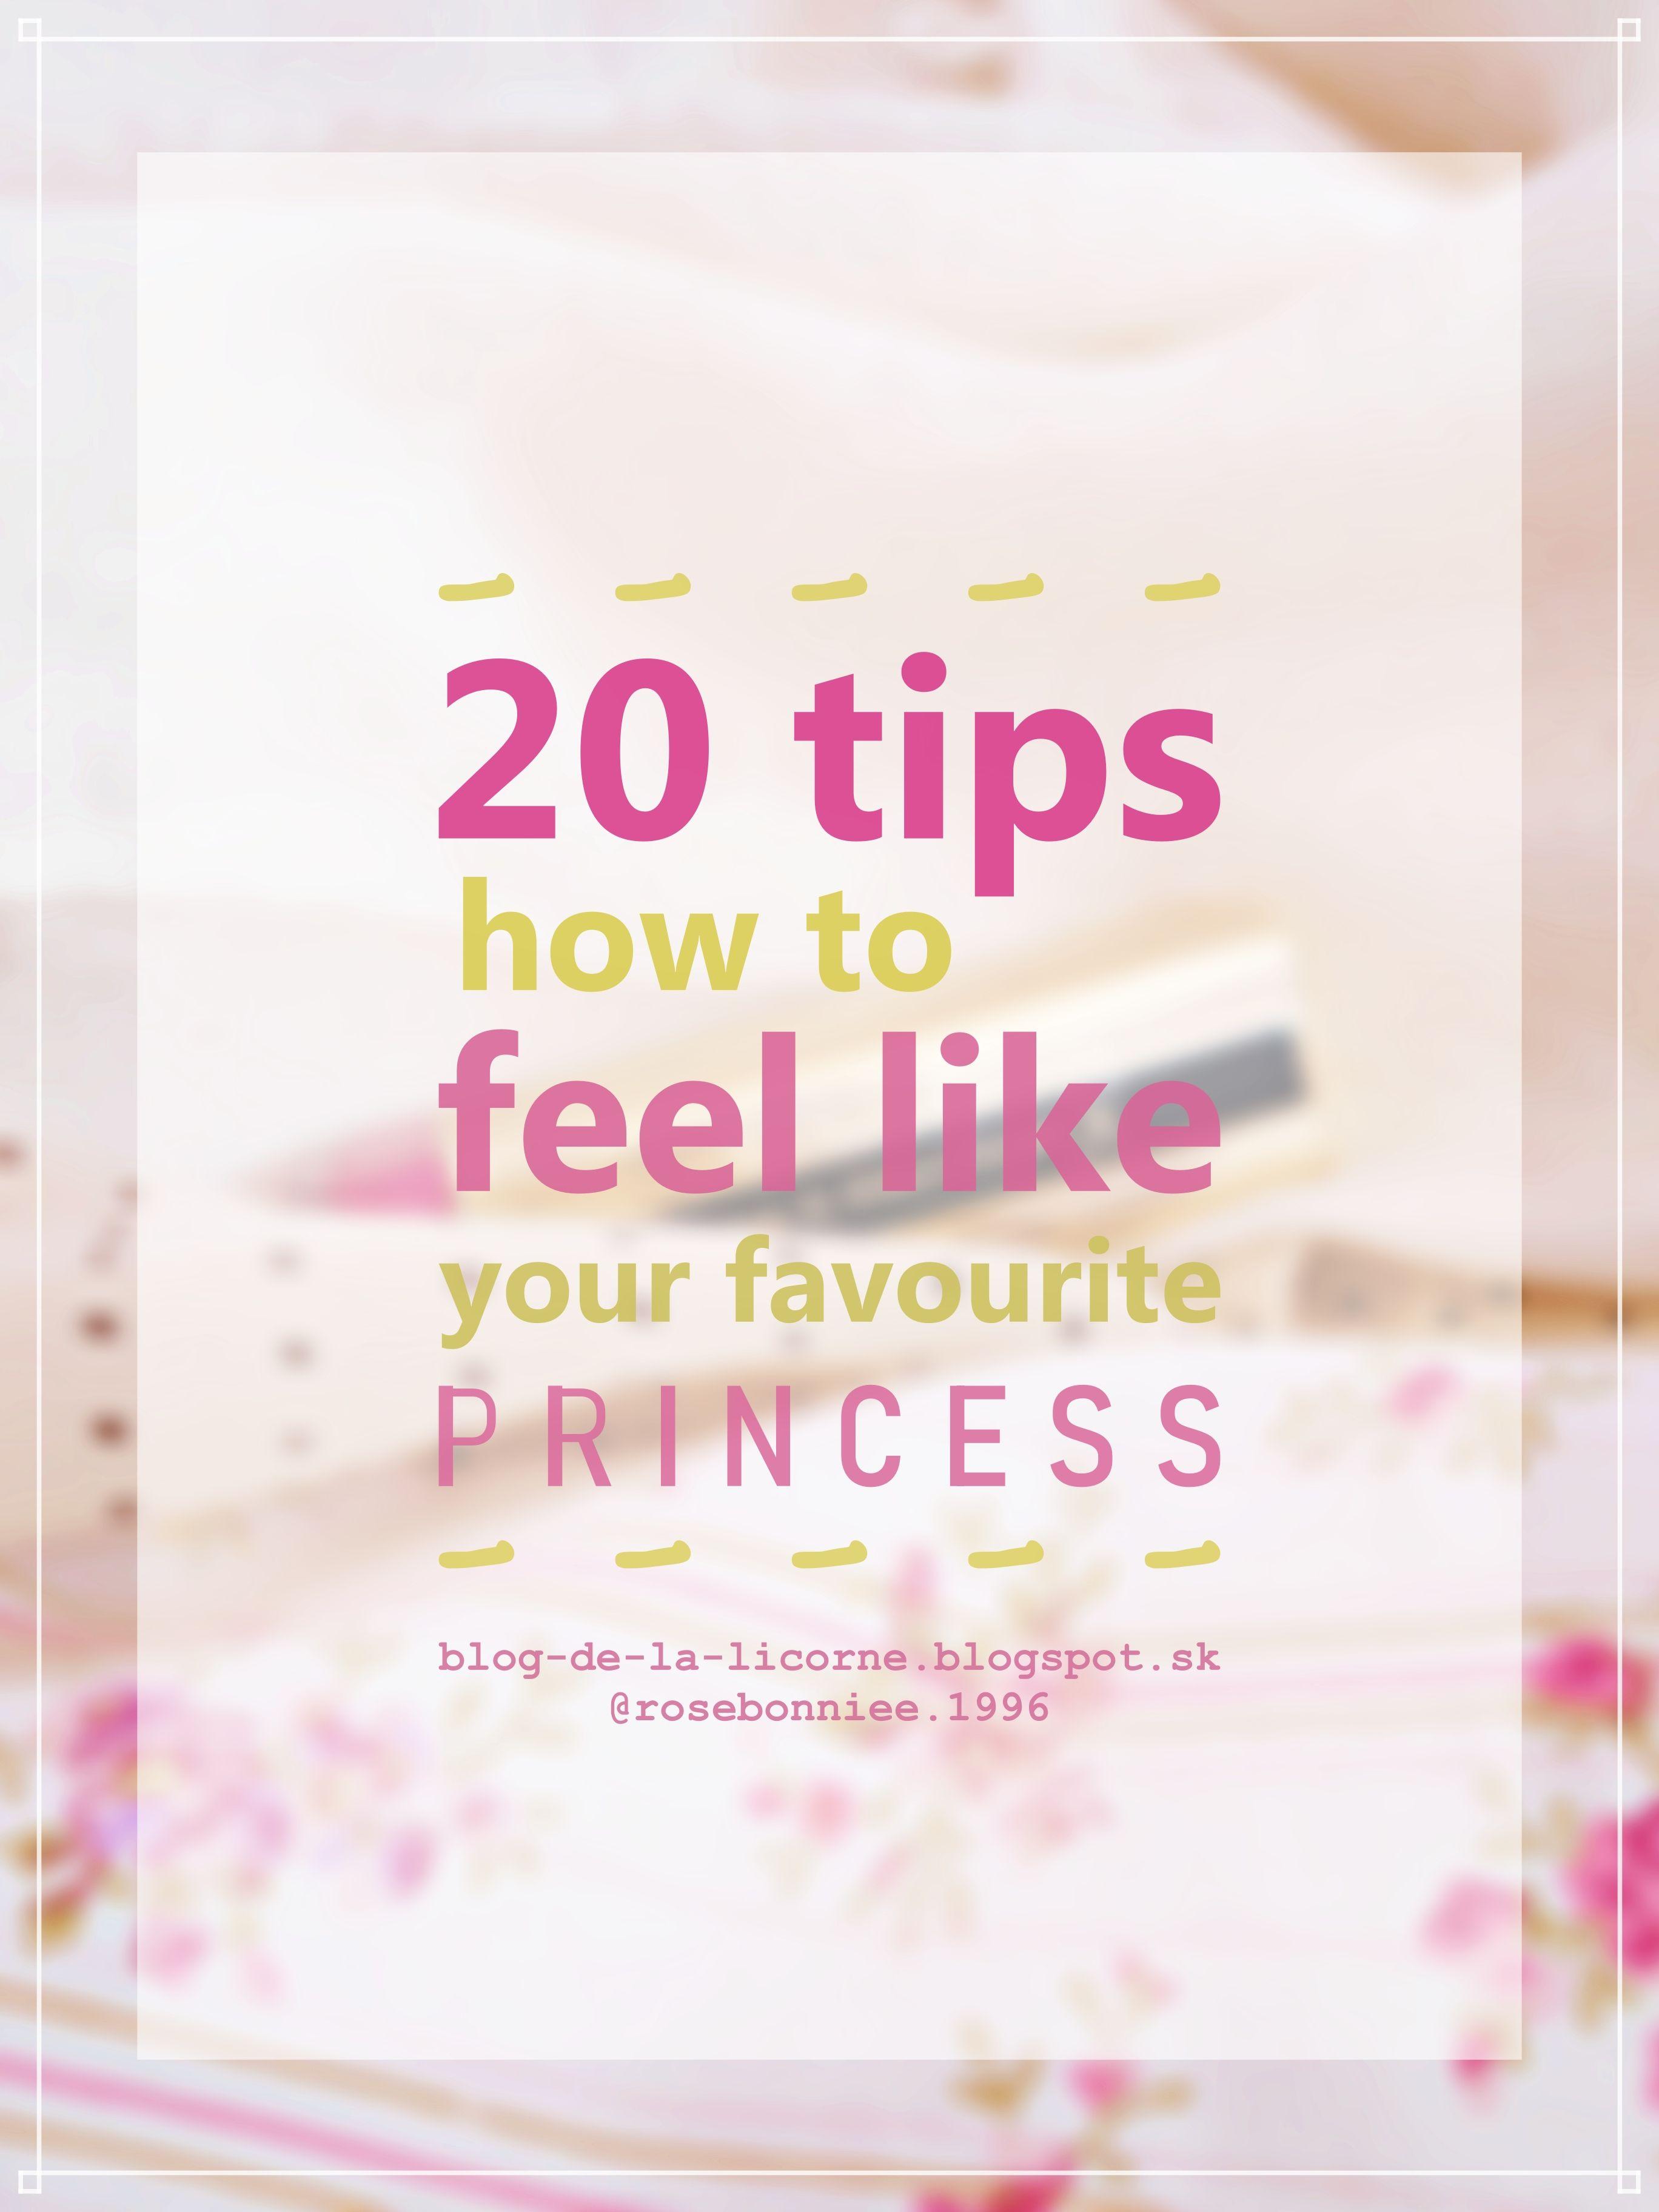 20 Tips How to Feel Like Princess 👸 | Blog de la Licorne | #blogdelalicorne #lifestyle #princess #howtofeellikeprincess #lifestyleblogger #tips #disney #disneyprincess #beauty #selflove #selfcare #inspiration #skincare #motivation #angelic #etheral